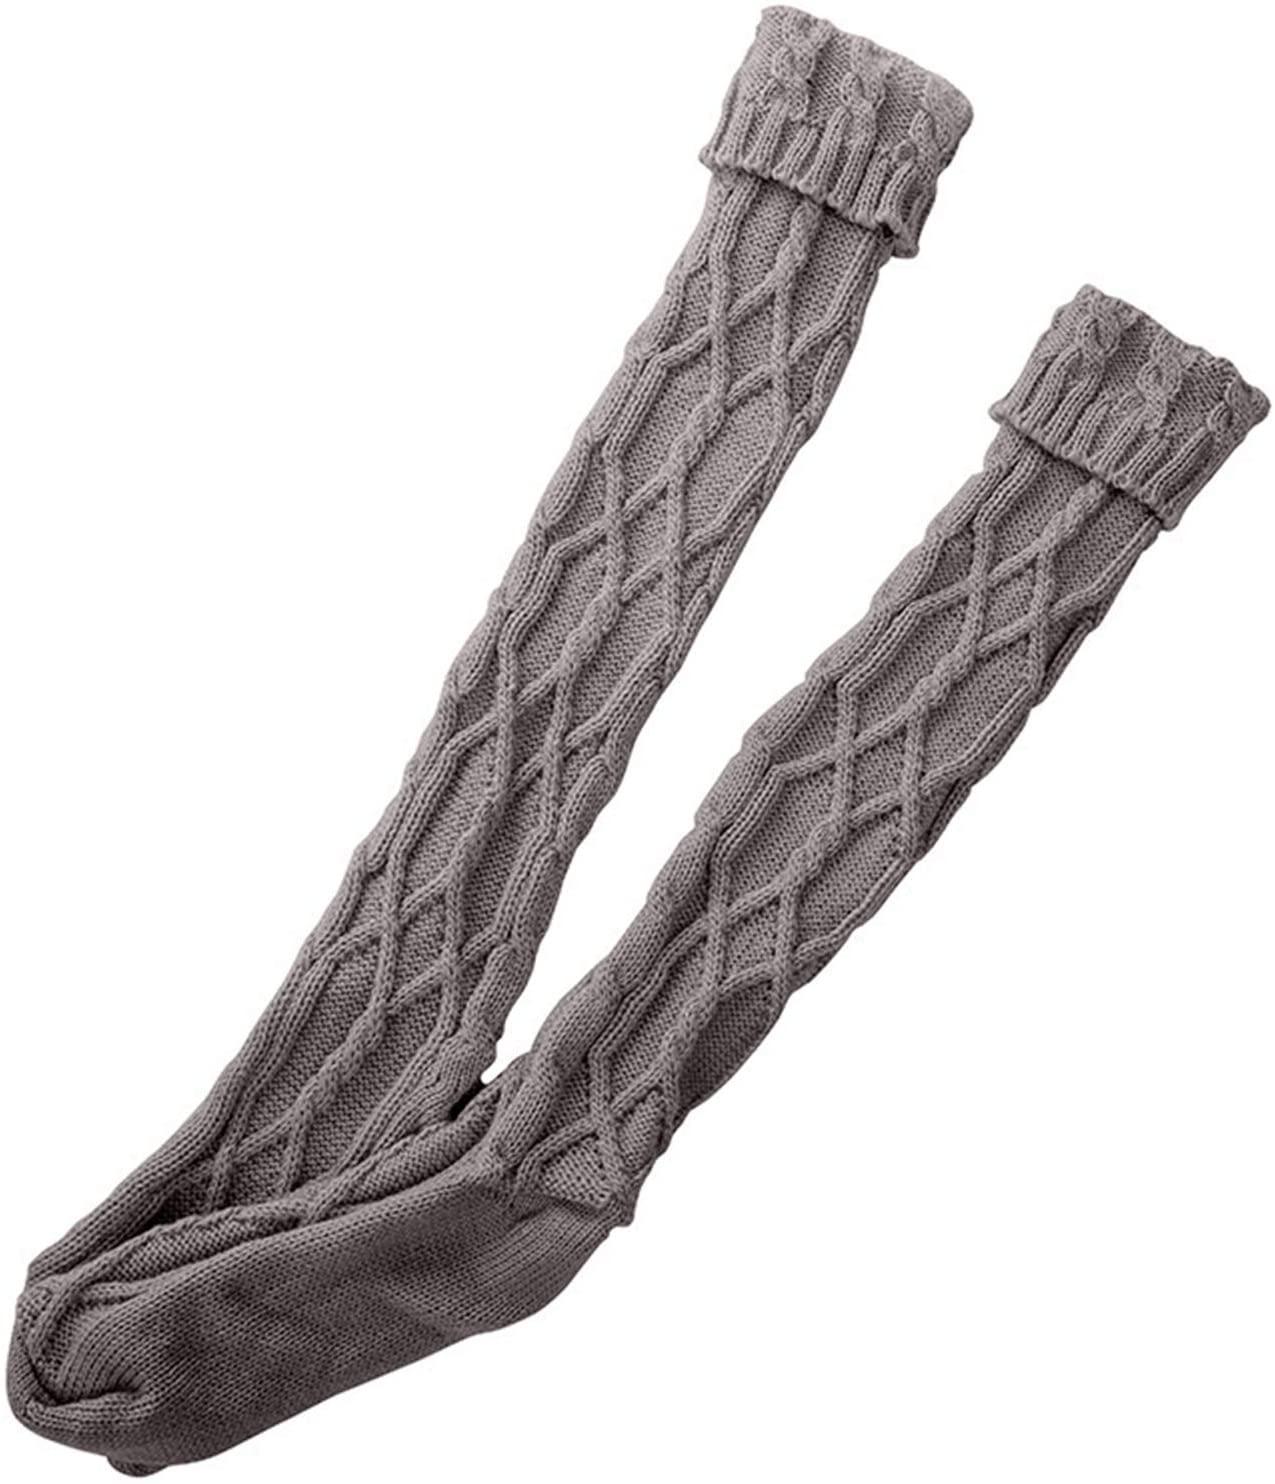 MoO1deer Womens Thigh High Socks, Over The Knee Socks, Leg Warmers, Women Autumn Winter Braided Knitted Knee-Length Socks Stockings Leg Warmers for Women Apricot One Size